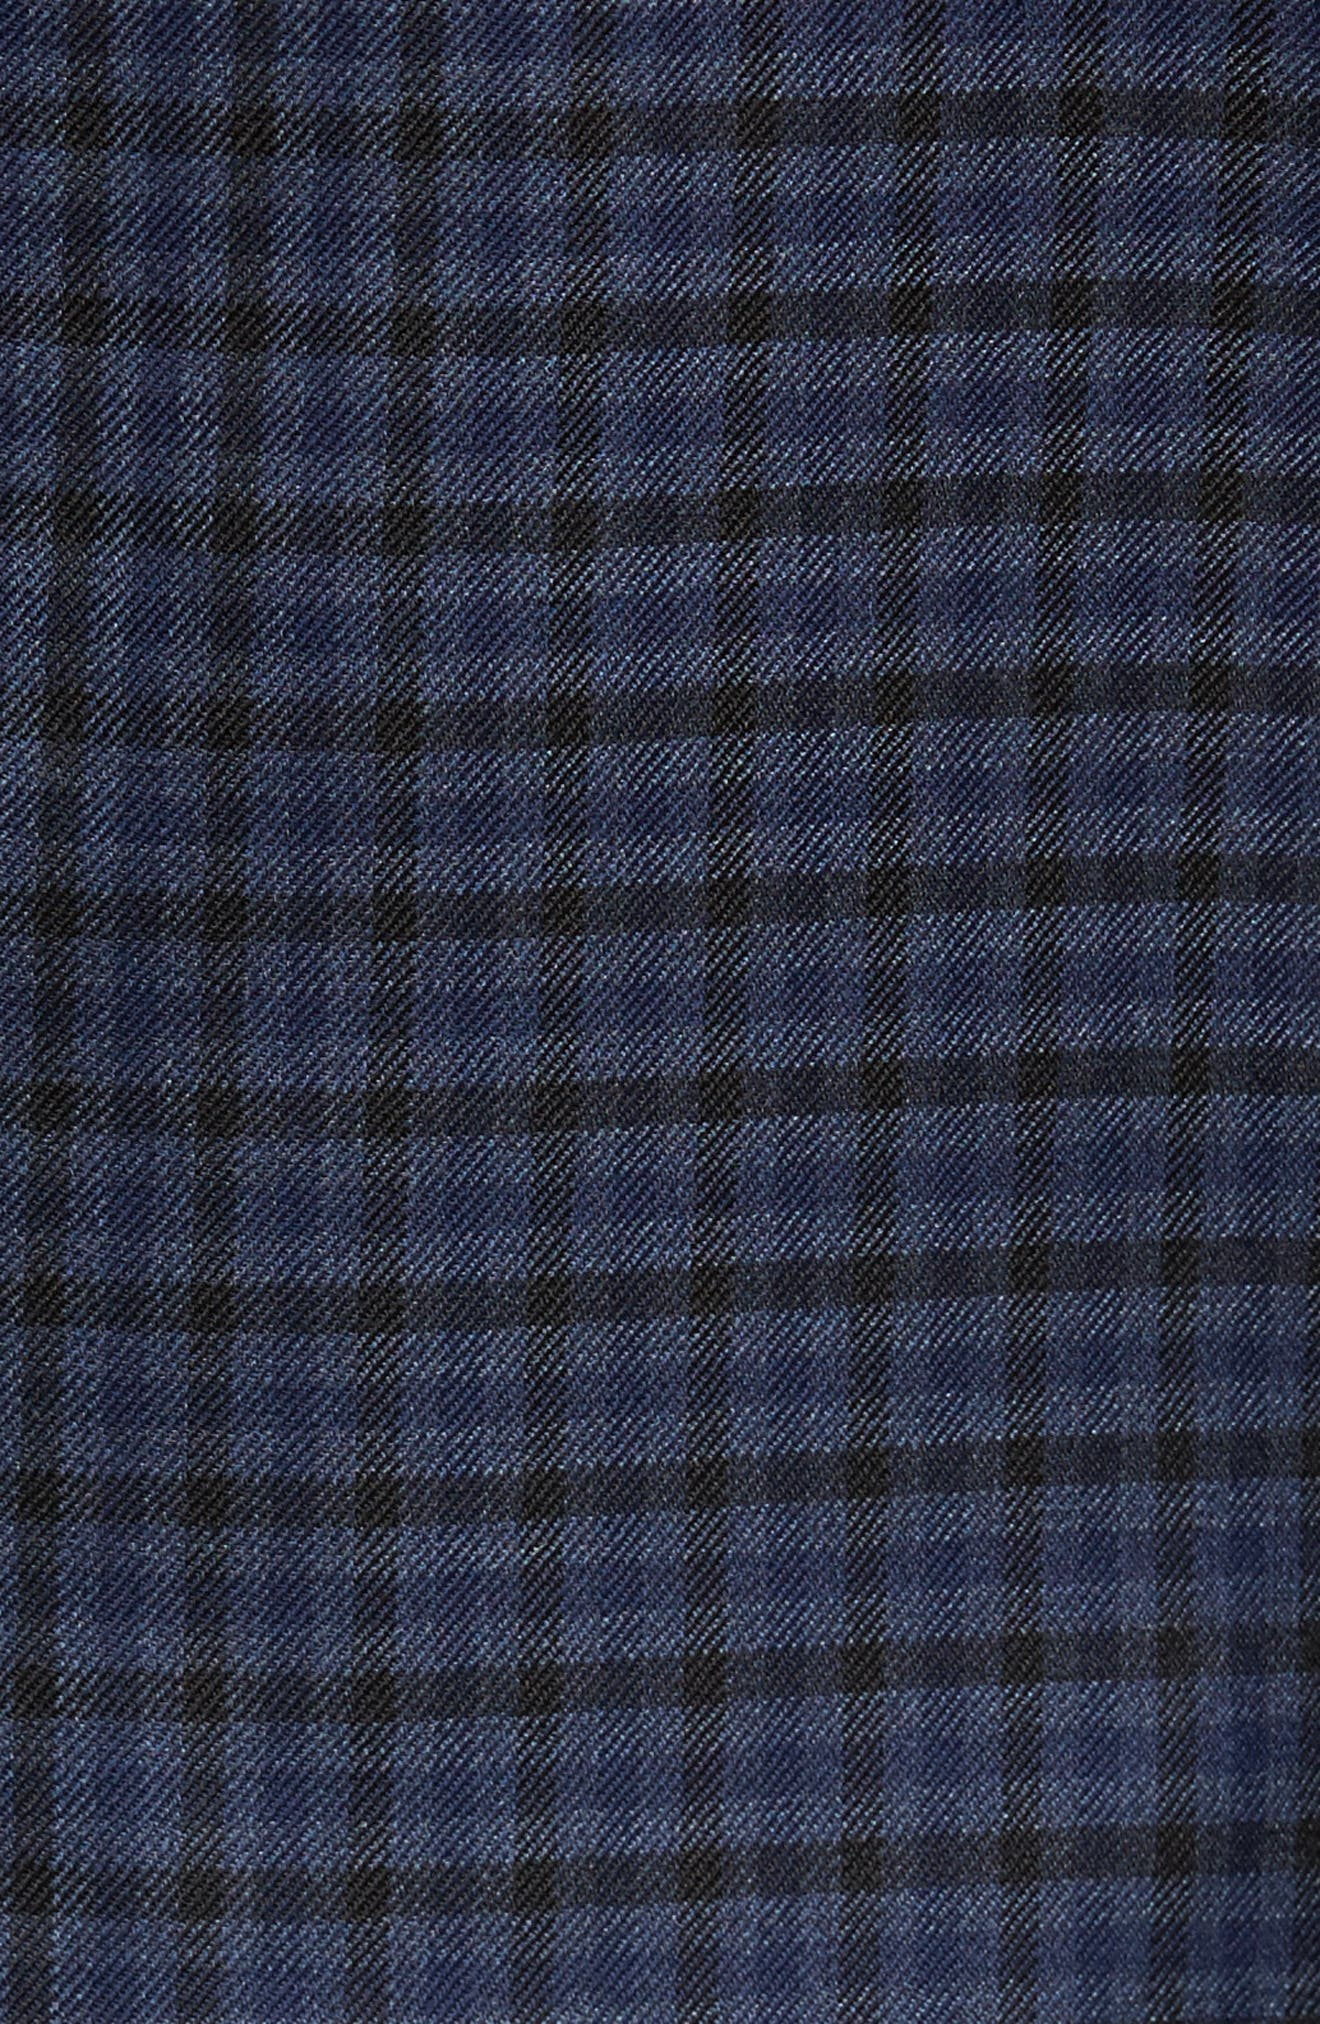 Classic Fit Plaid Wool Sport Coat,                             Alternate thumbnail 5, color,                             Navy